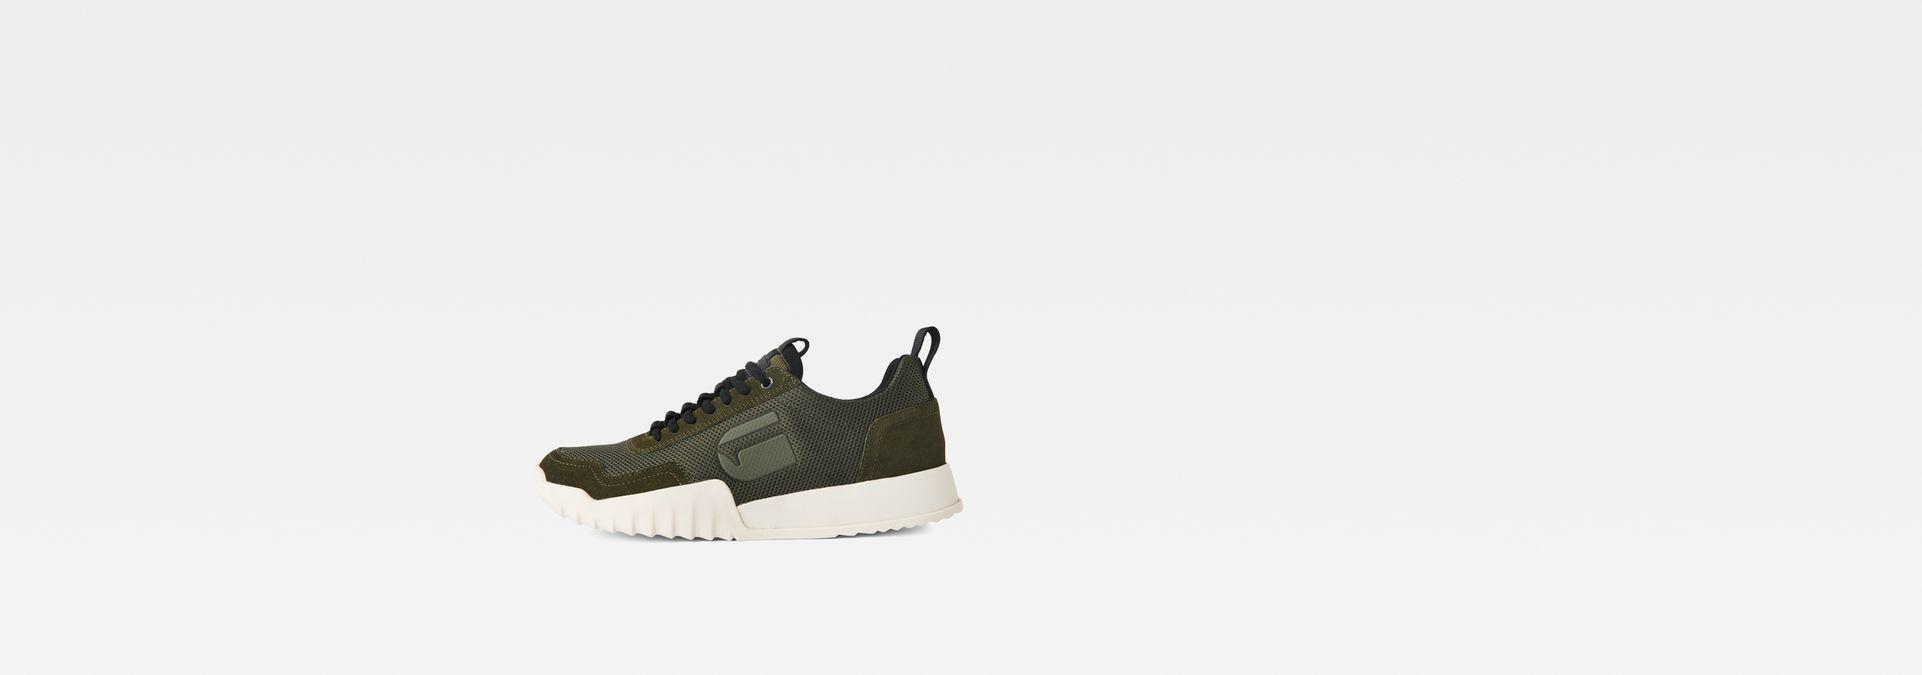 G-Star RAW® Rackam Rovic Sneaker Green side view ... 4eb0d59971615